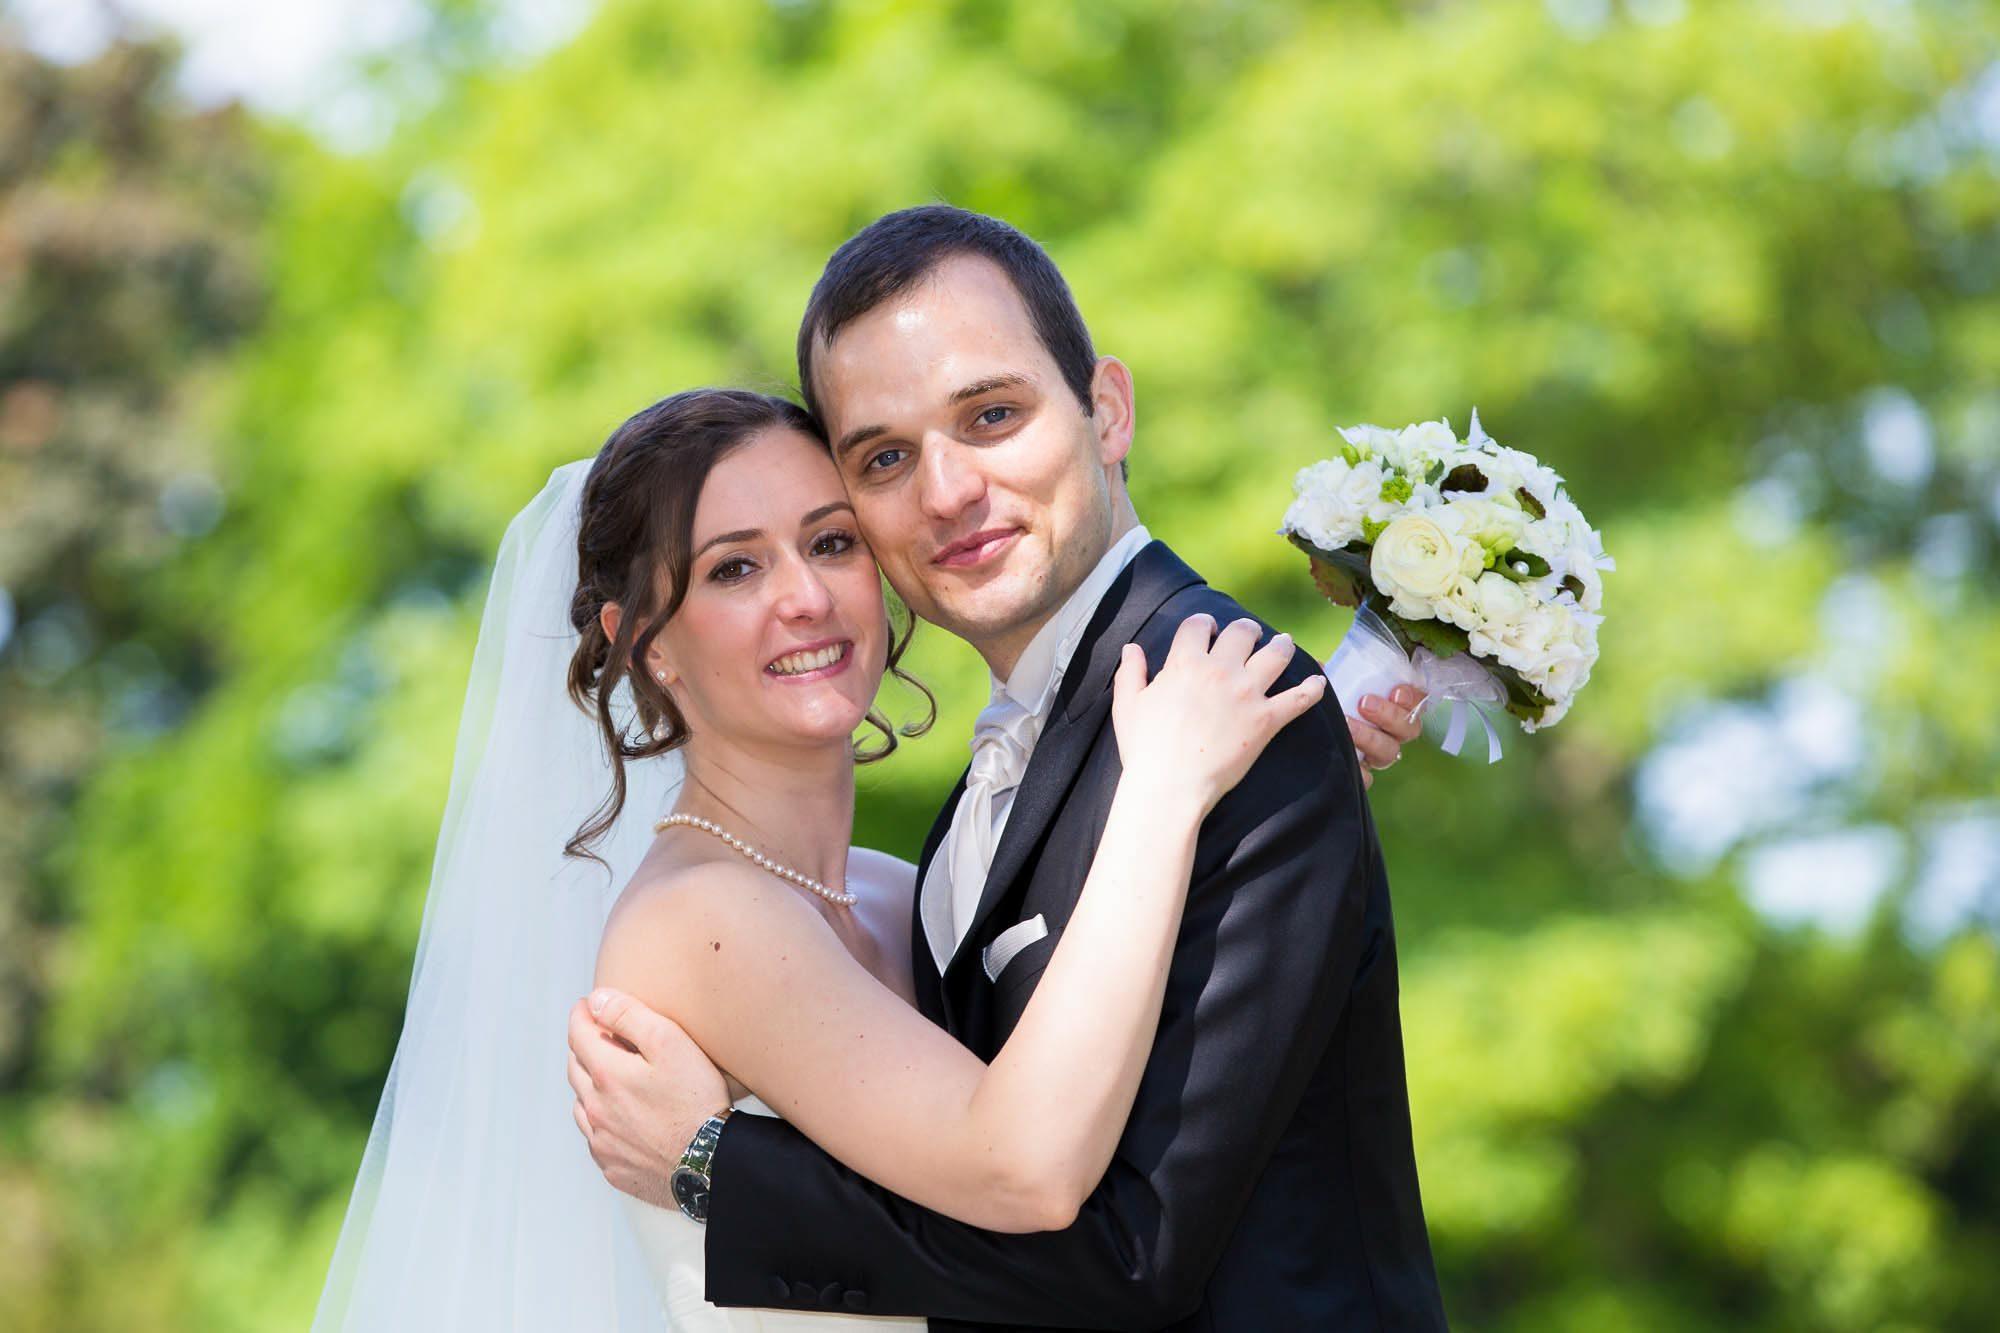 photographe mariage versailles 78000